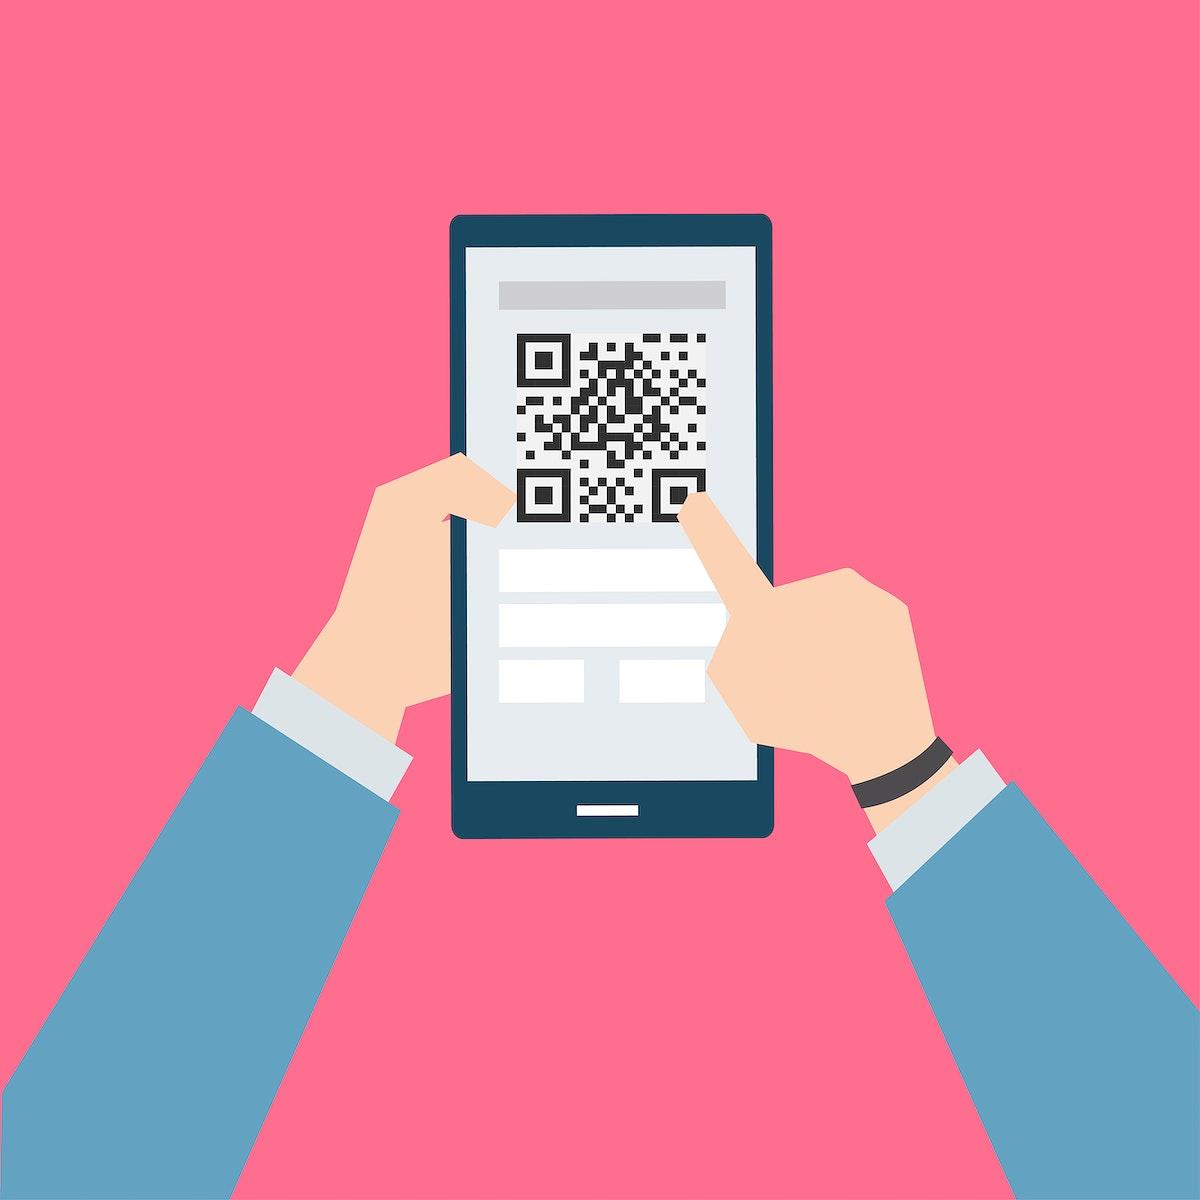 Businessman holding a smartphone illustration